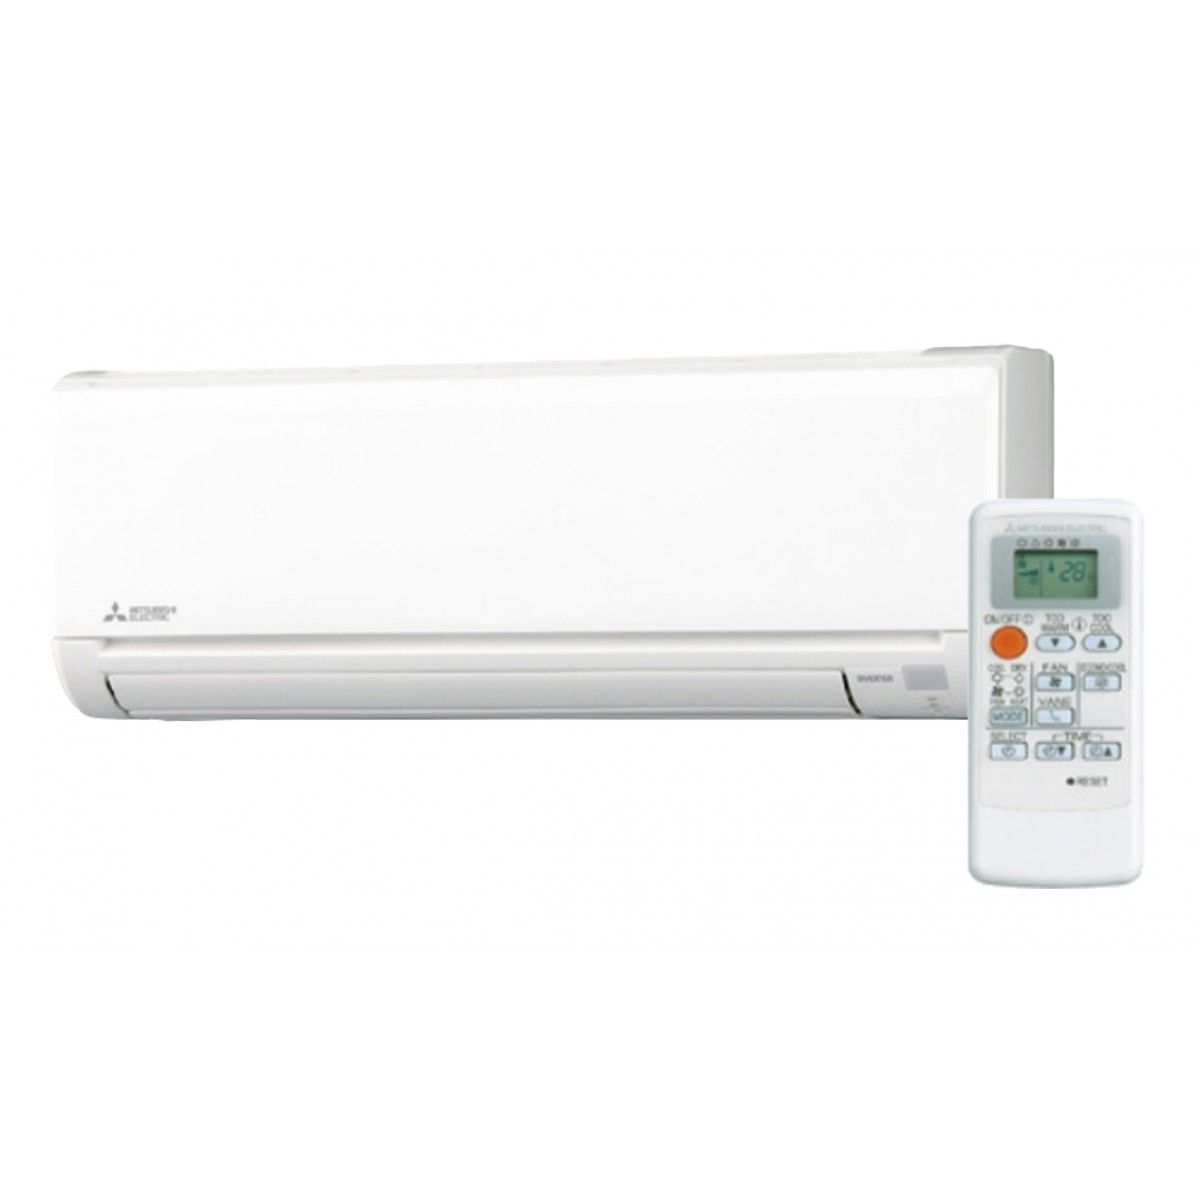 Mitsubishi Heating Cooling Wall Unit : Mitsubishi msz hm series k btu seer heat pump wall